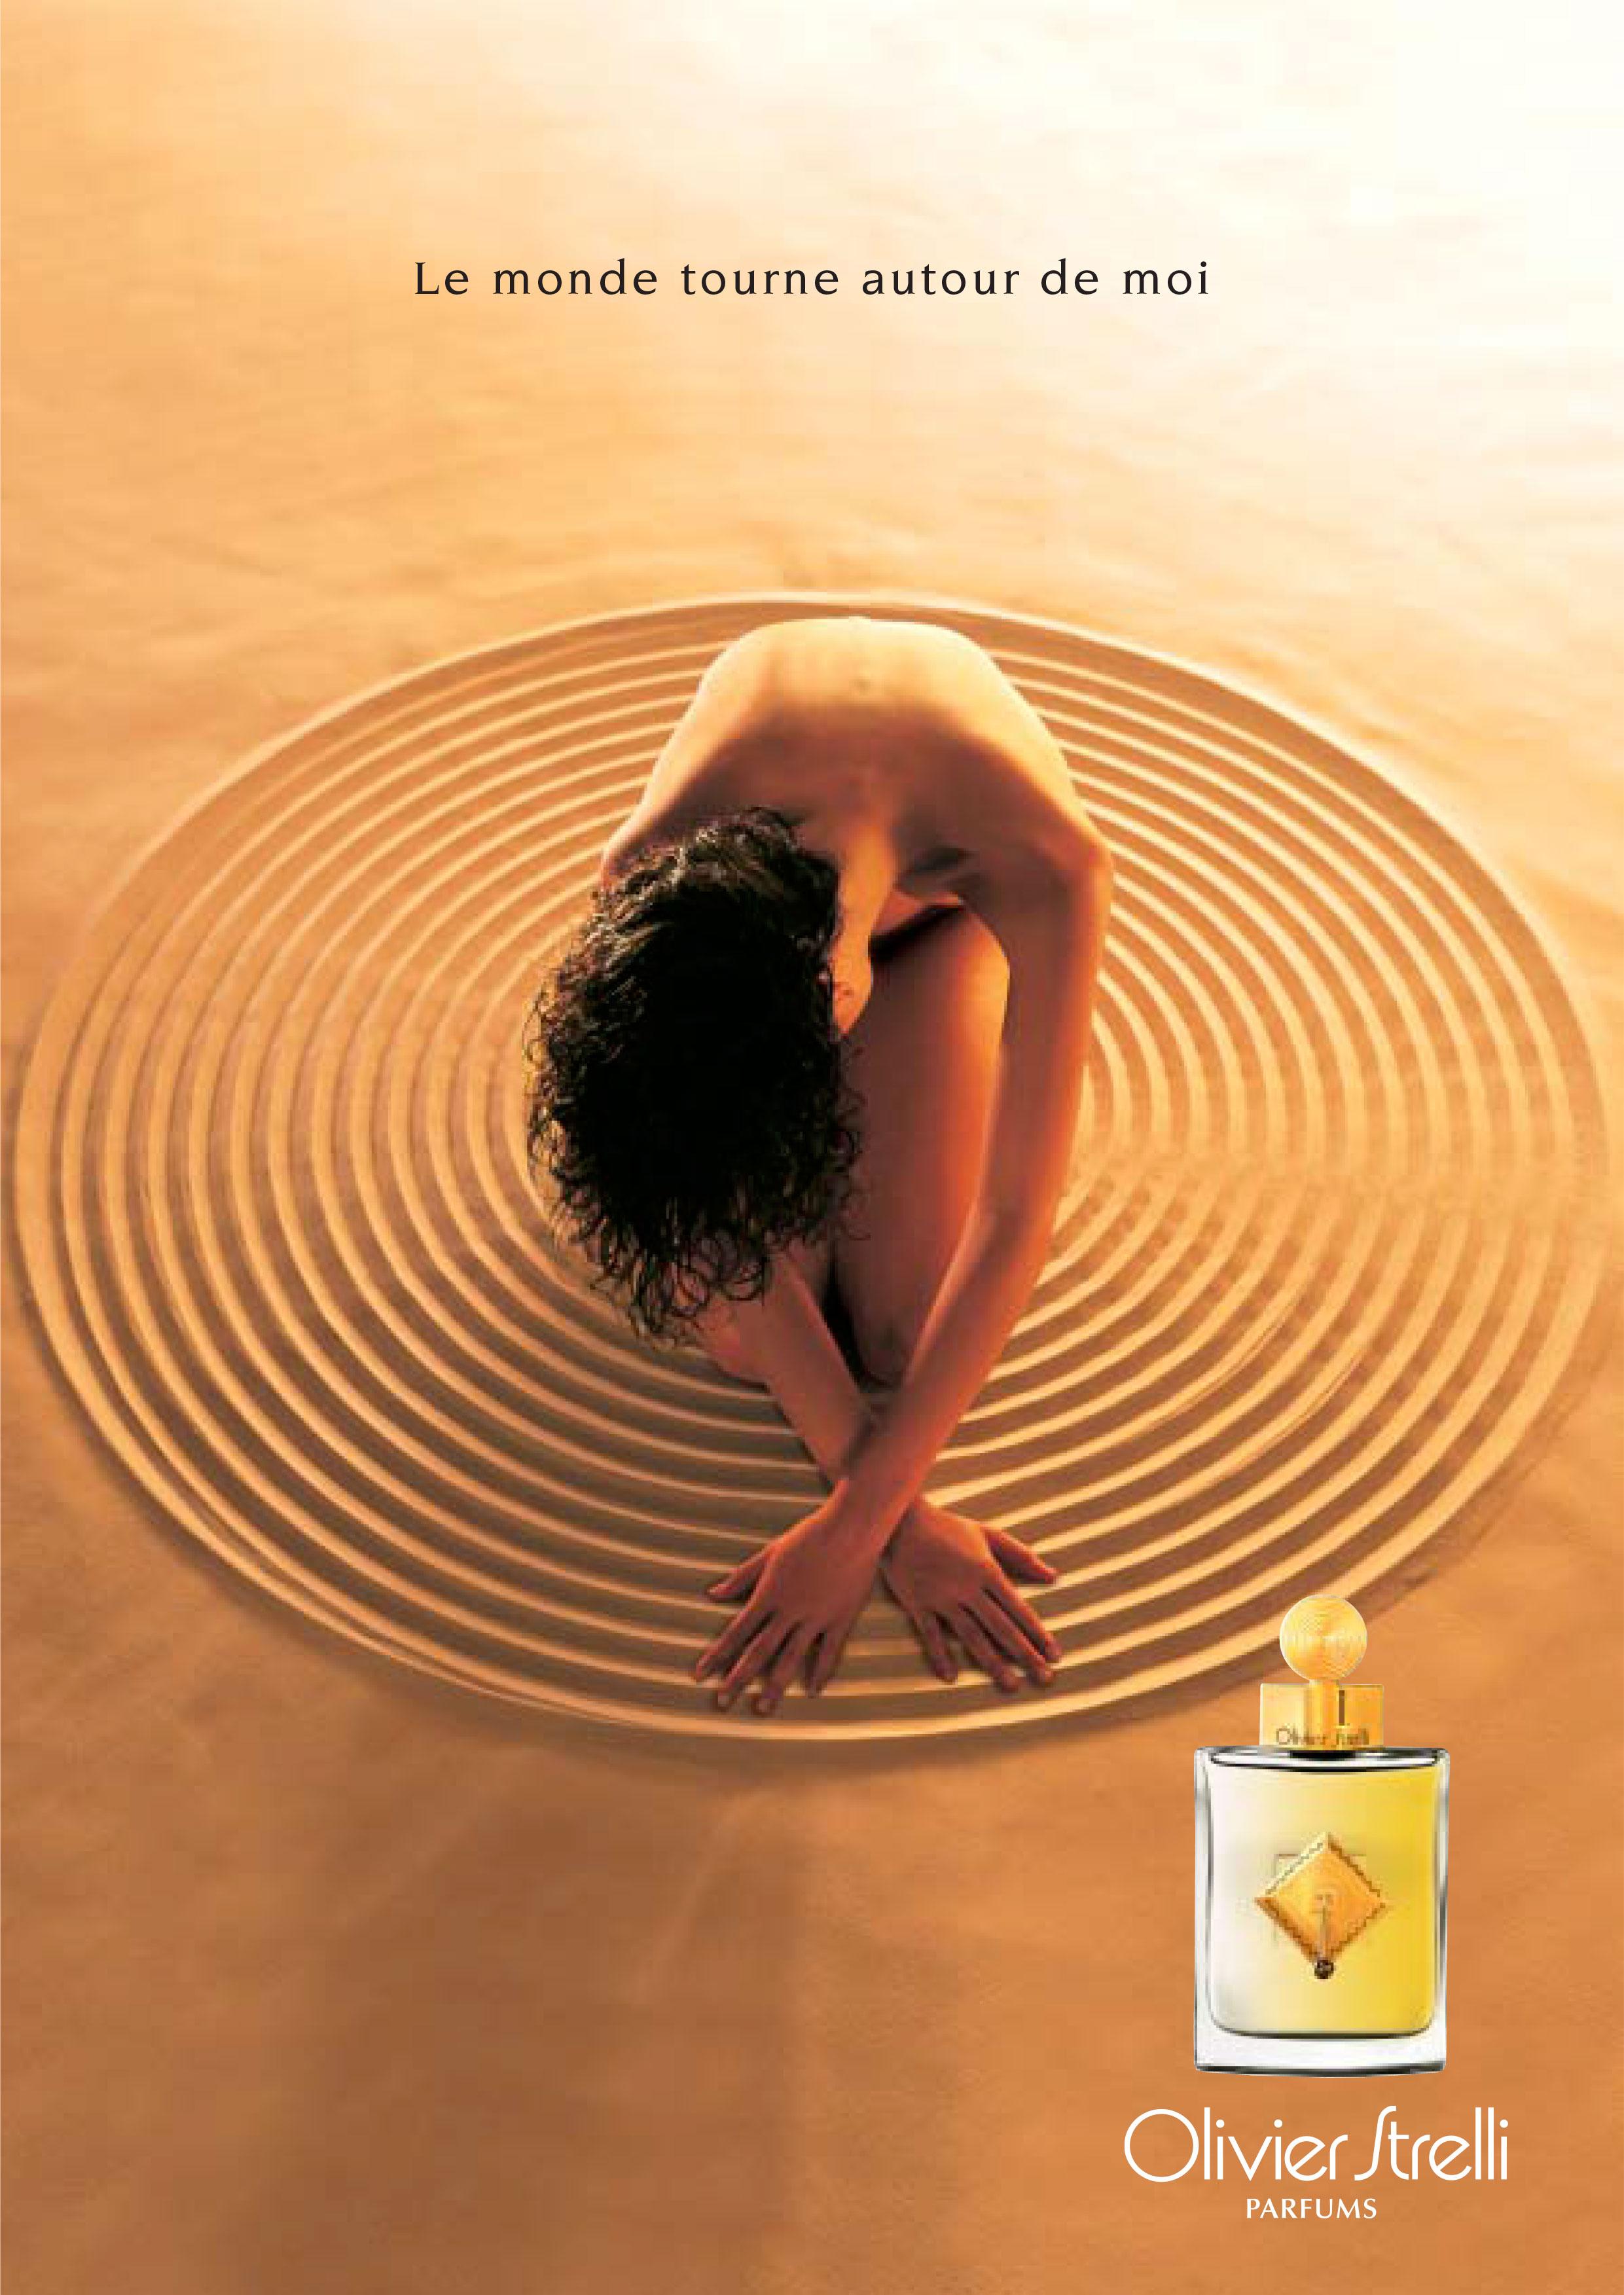 Olivier-strelli-parfums.jpg